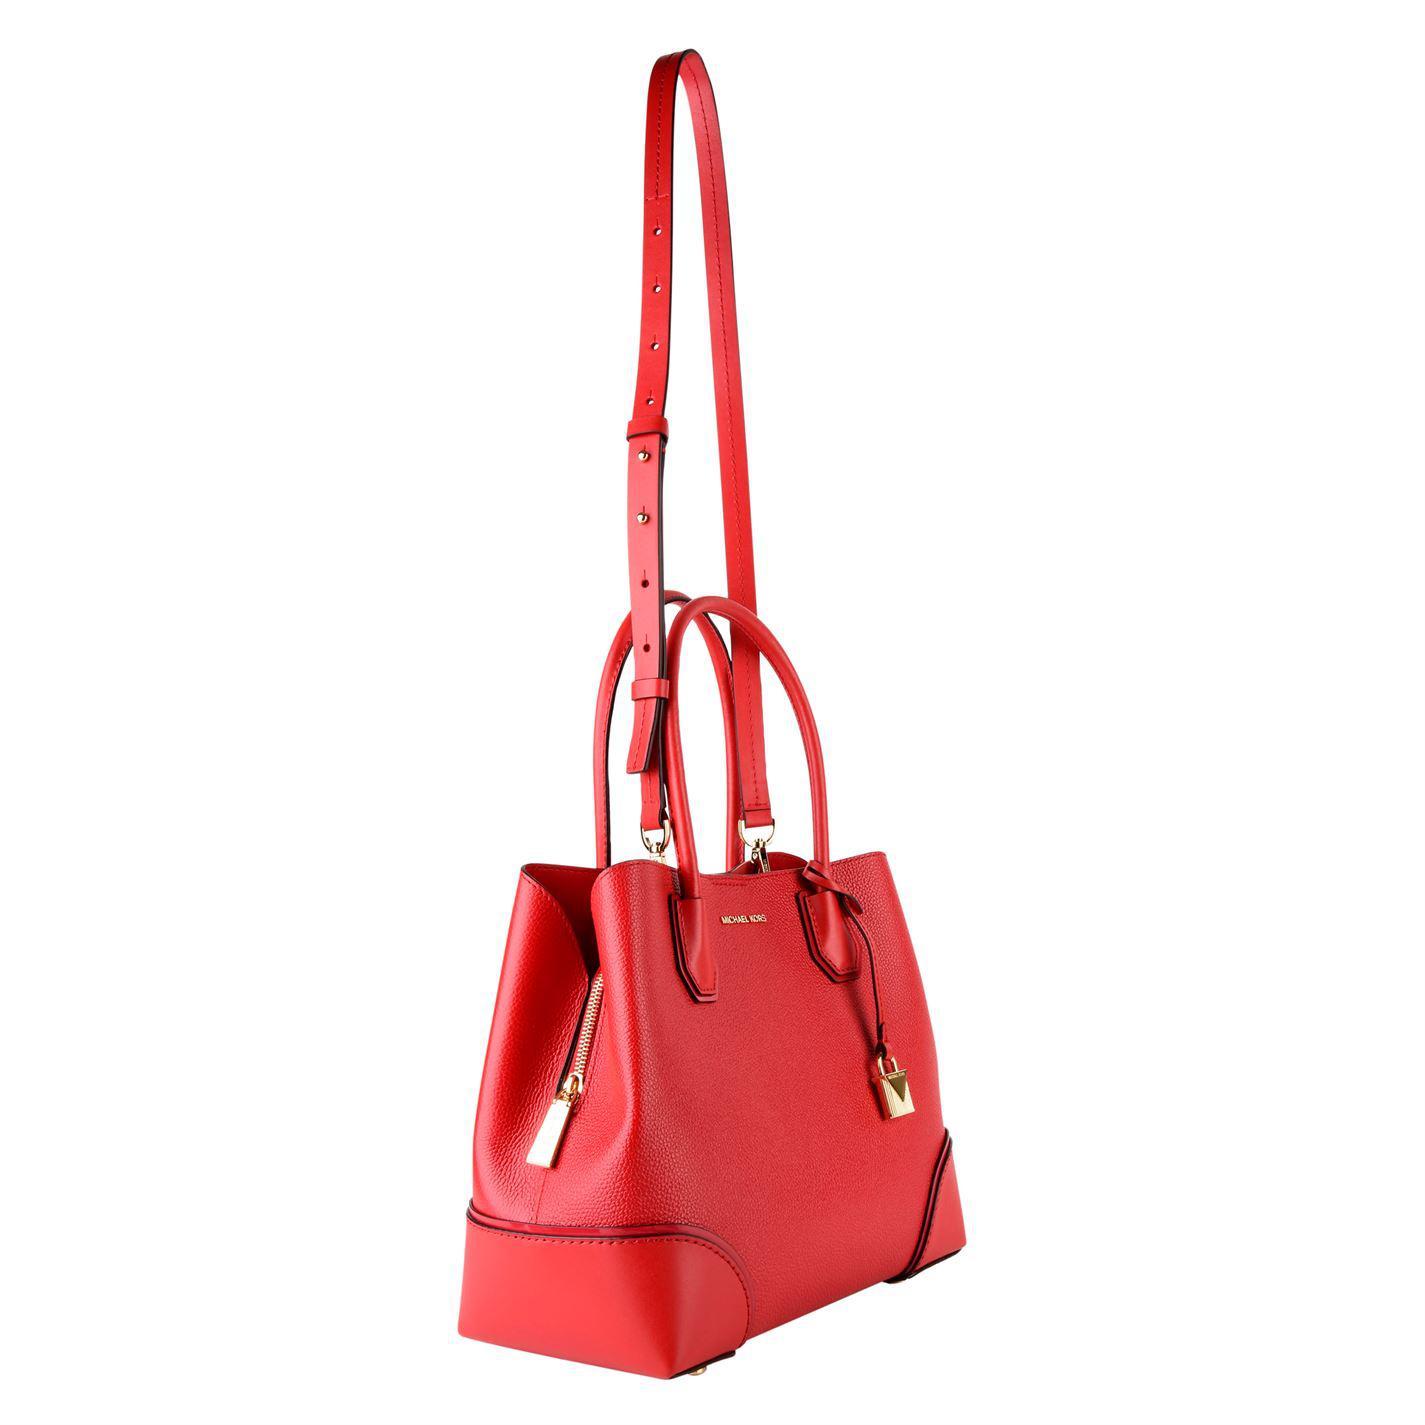 c1572e2b368397 Lyst - MICHAEL Michael Kors Annie Tote Bag in Red